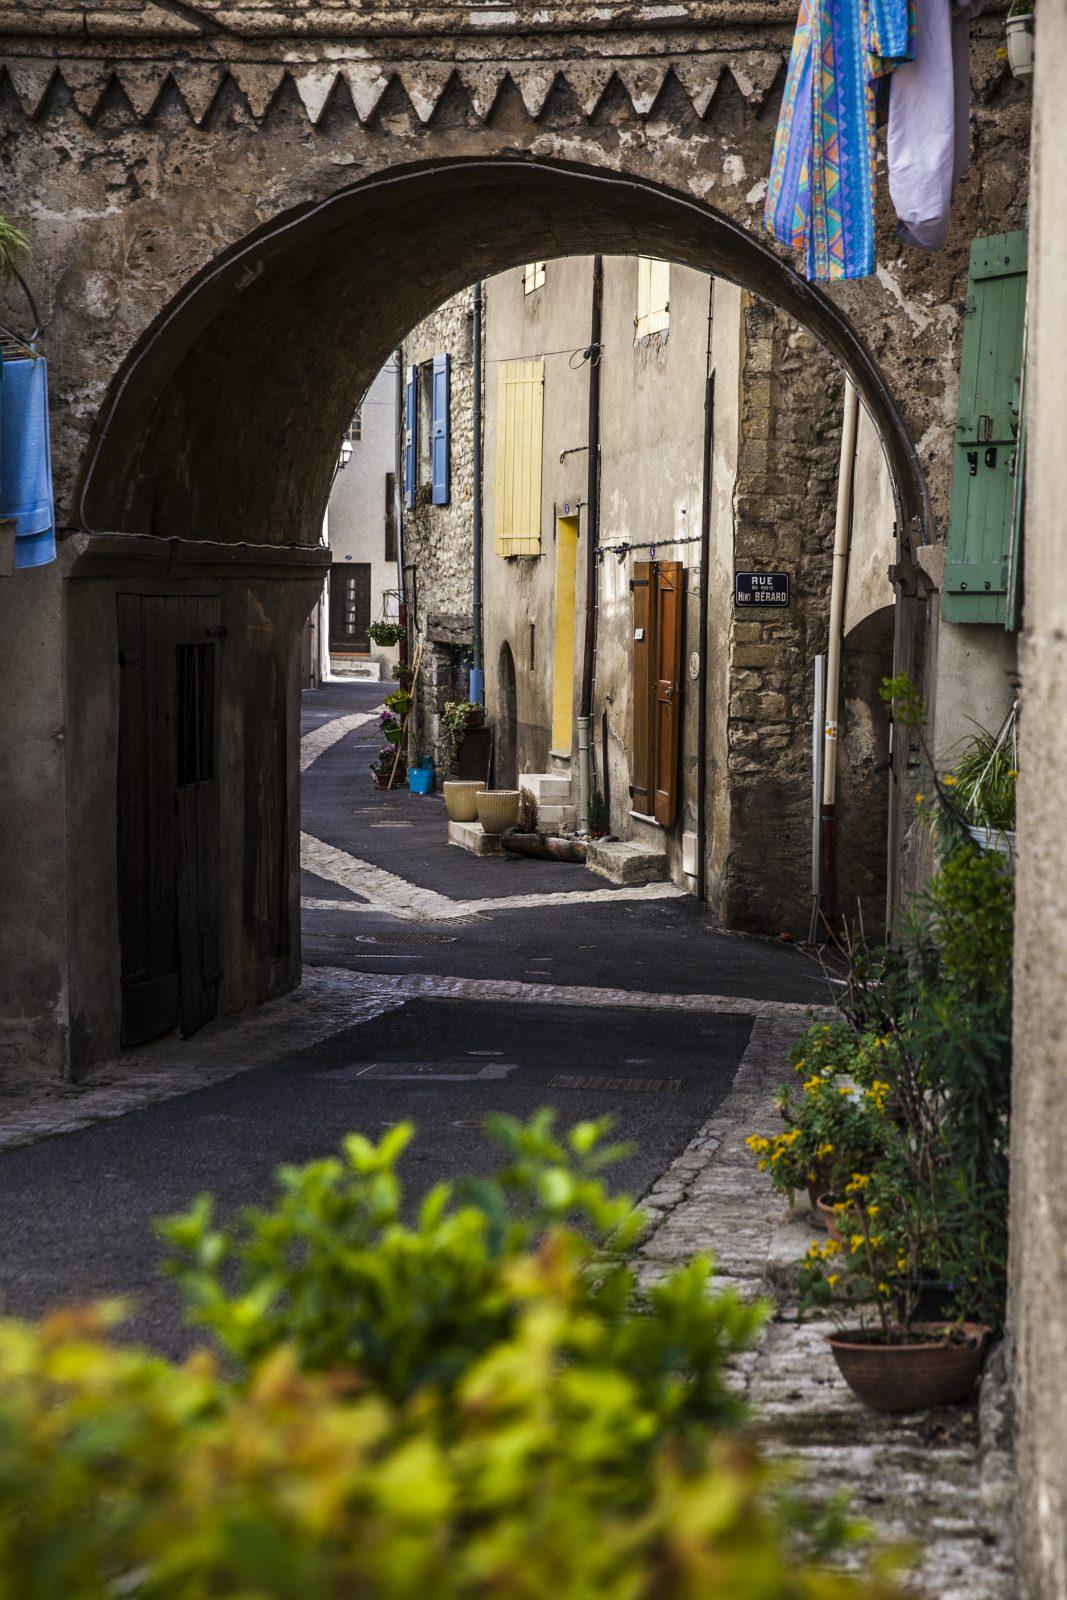 Village de Peyruis